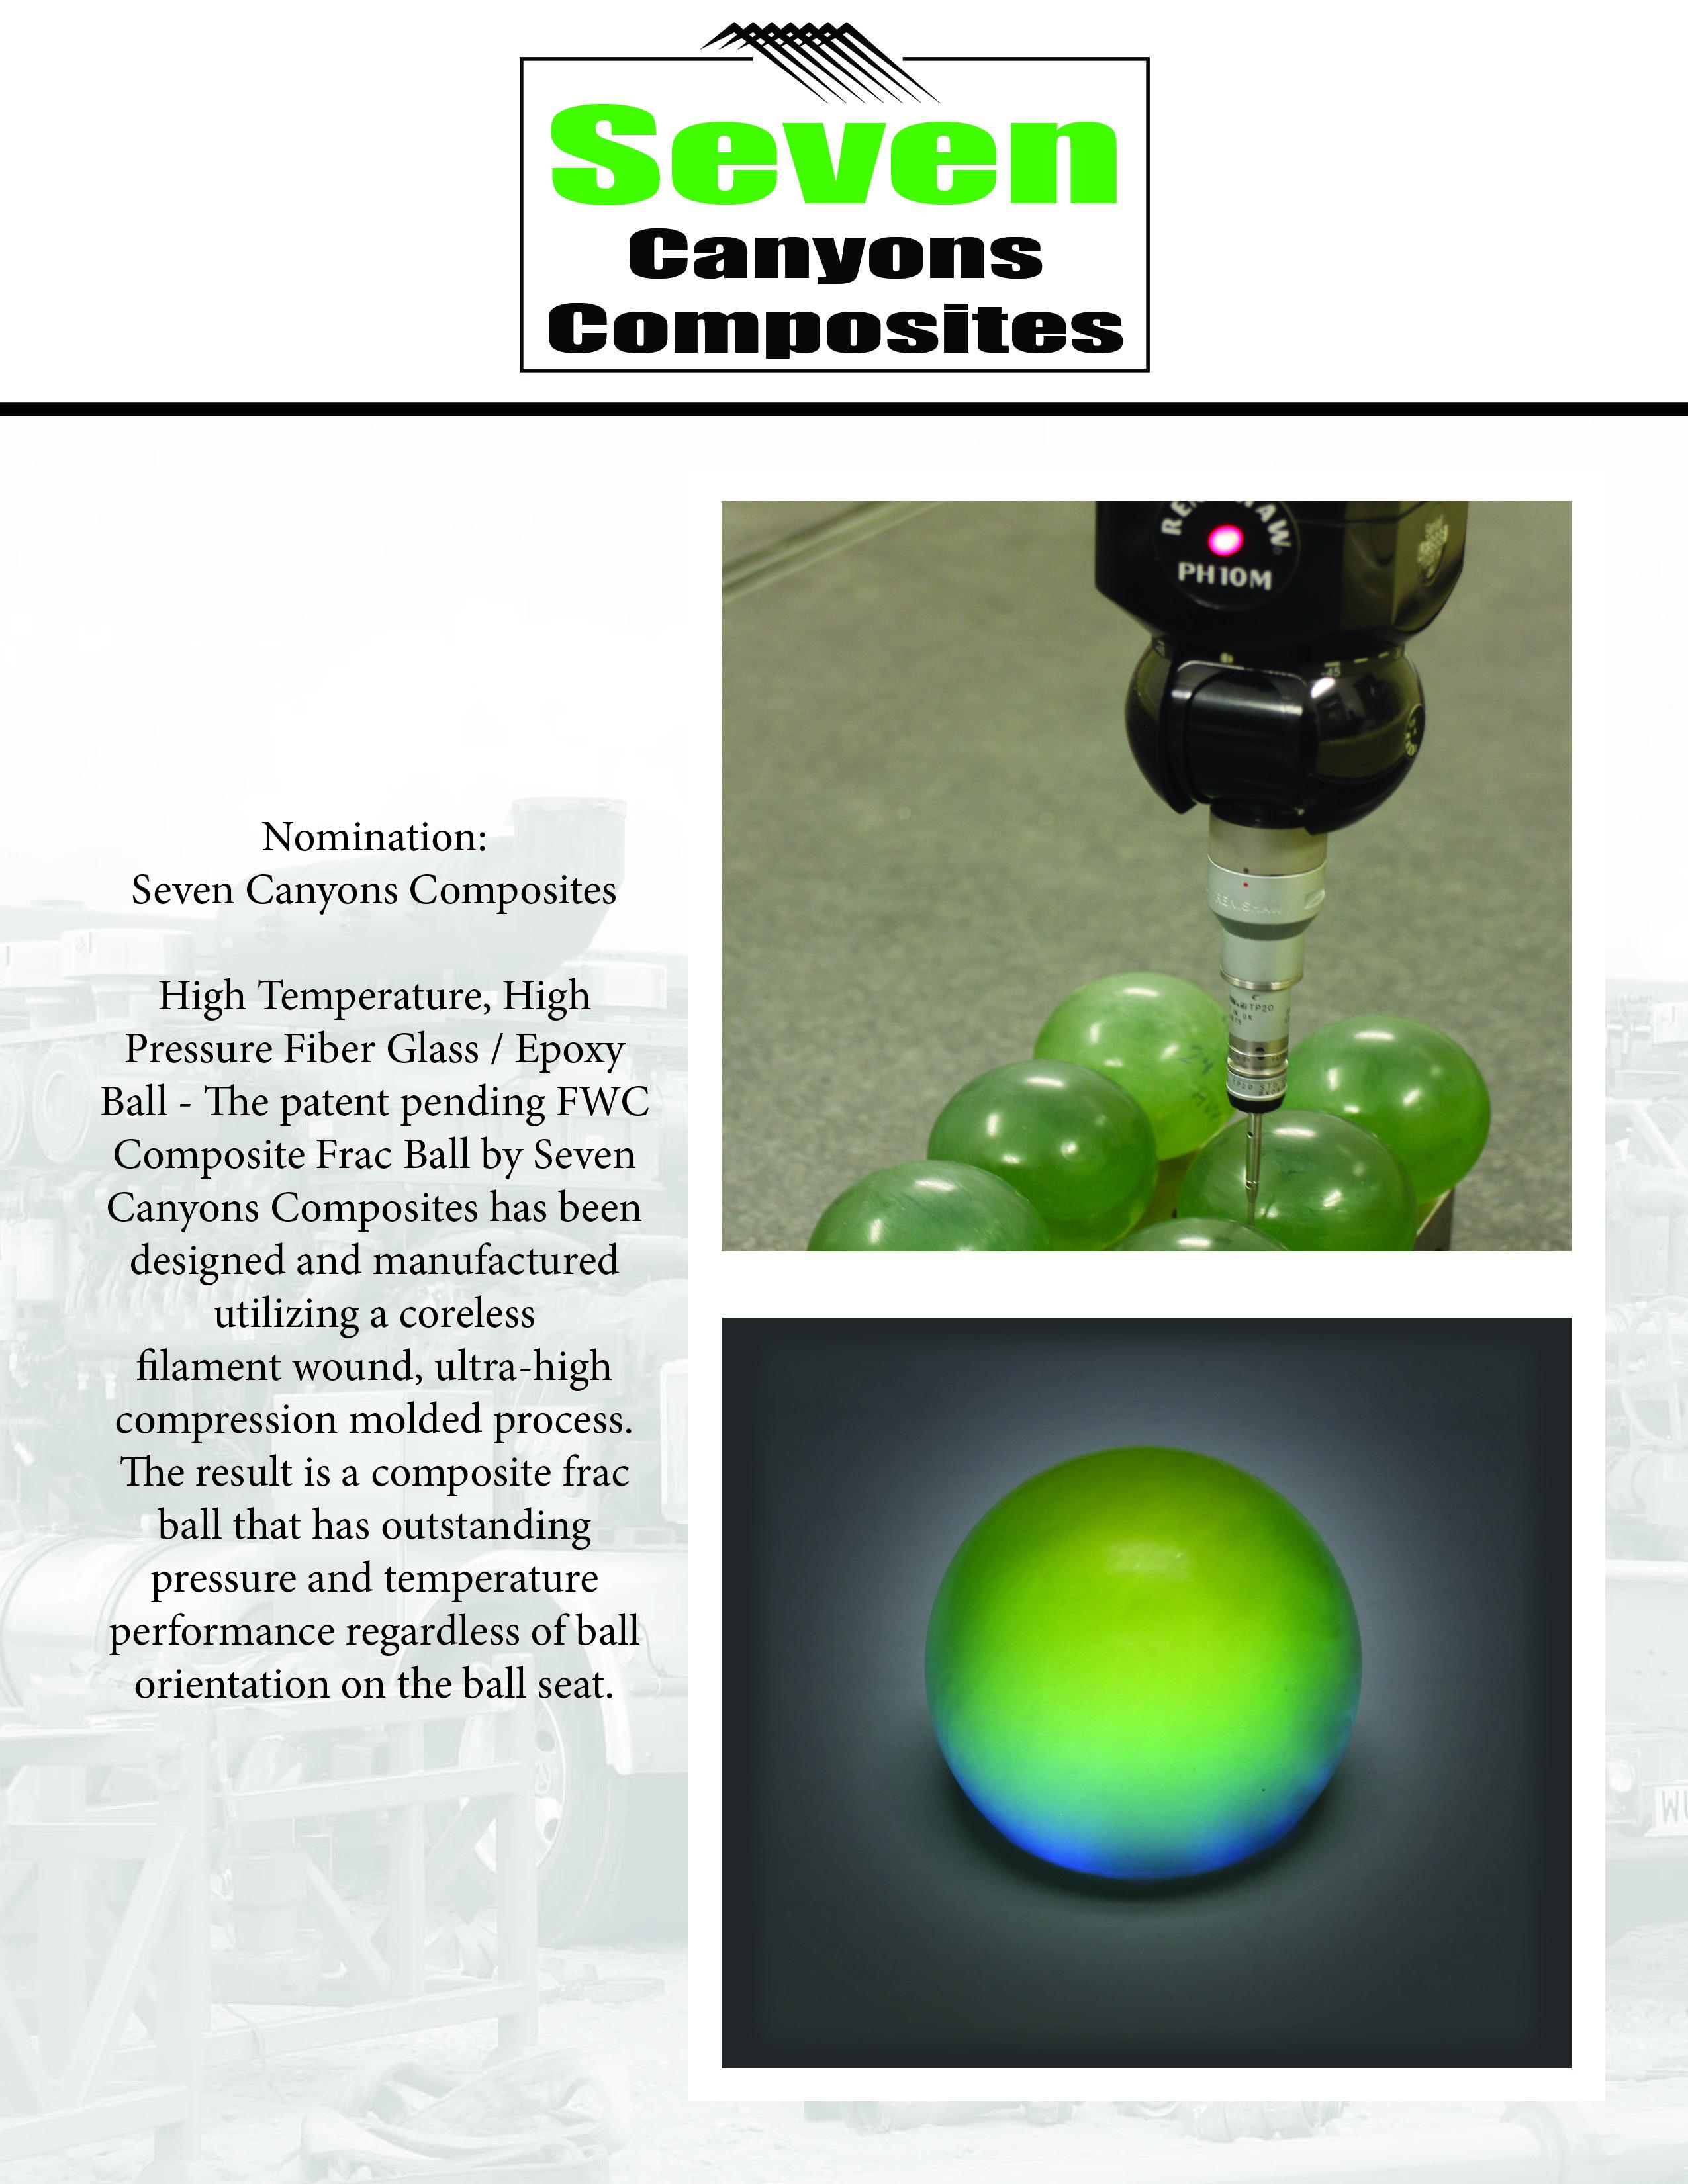 advanced composites inc fwc composite frac ball